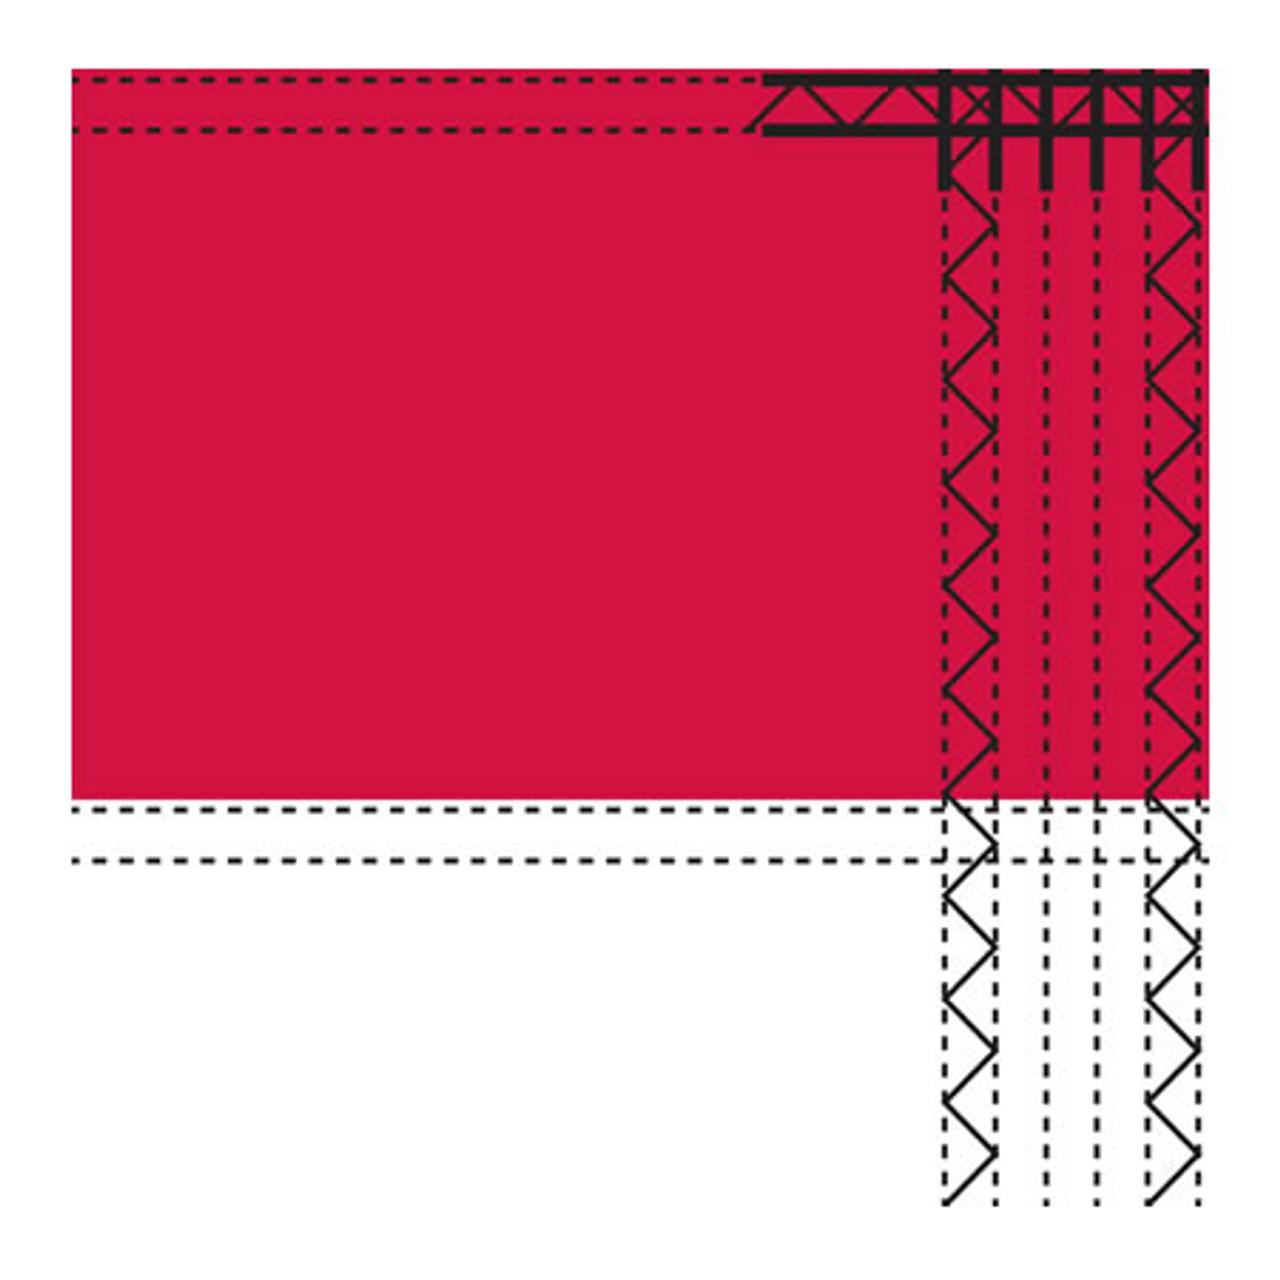 10' x 19' Polyester Texas Flag